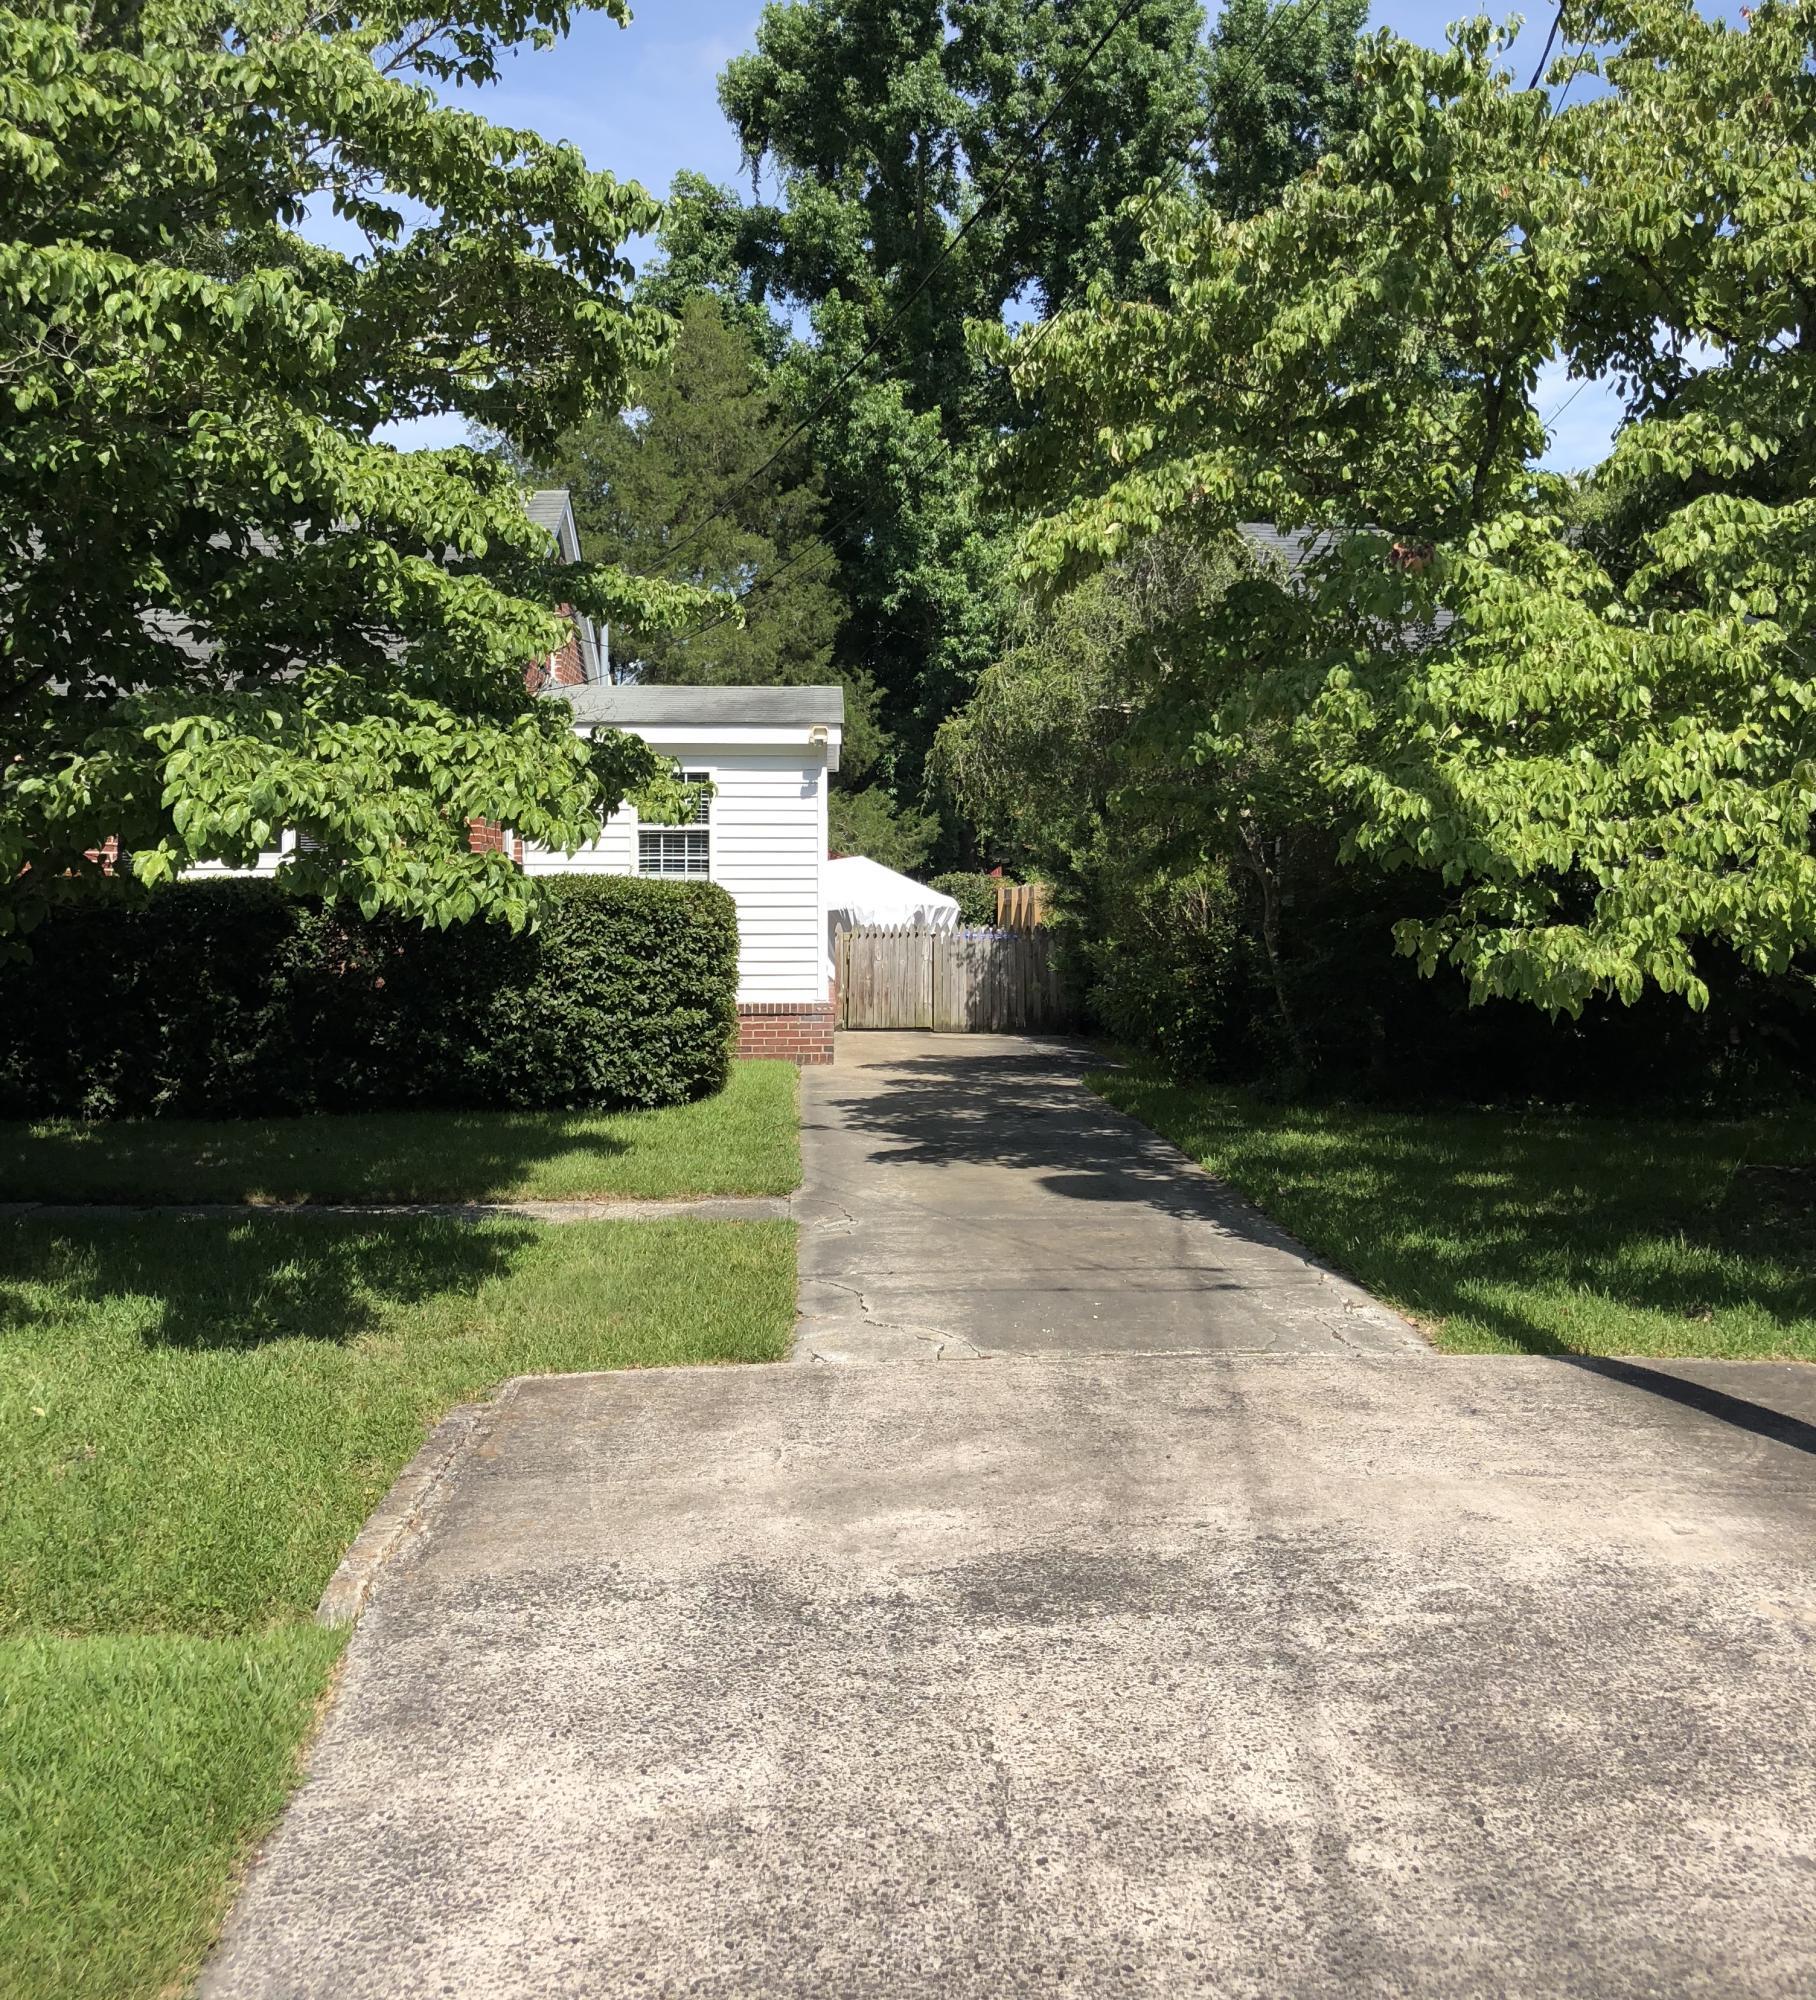 Edgewood Gardens Homes For Sale - 516 Risher, Charleston, SC - 2